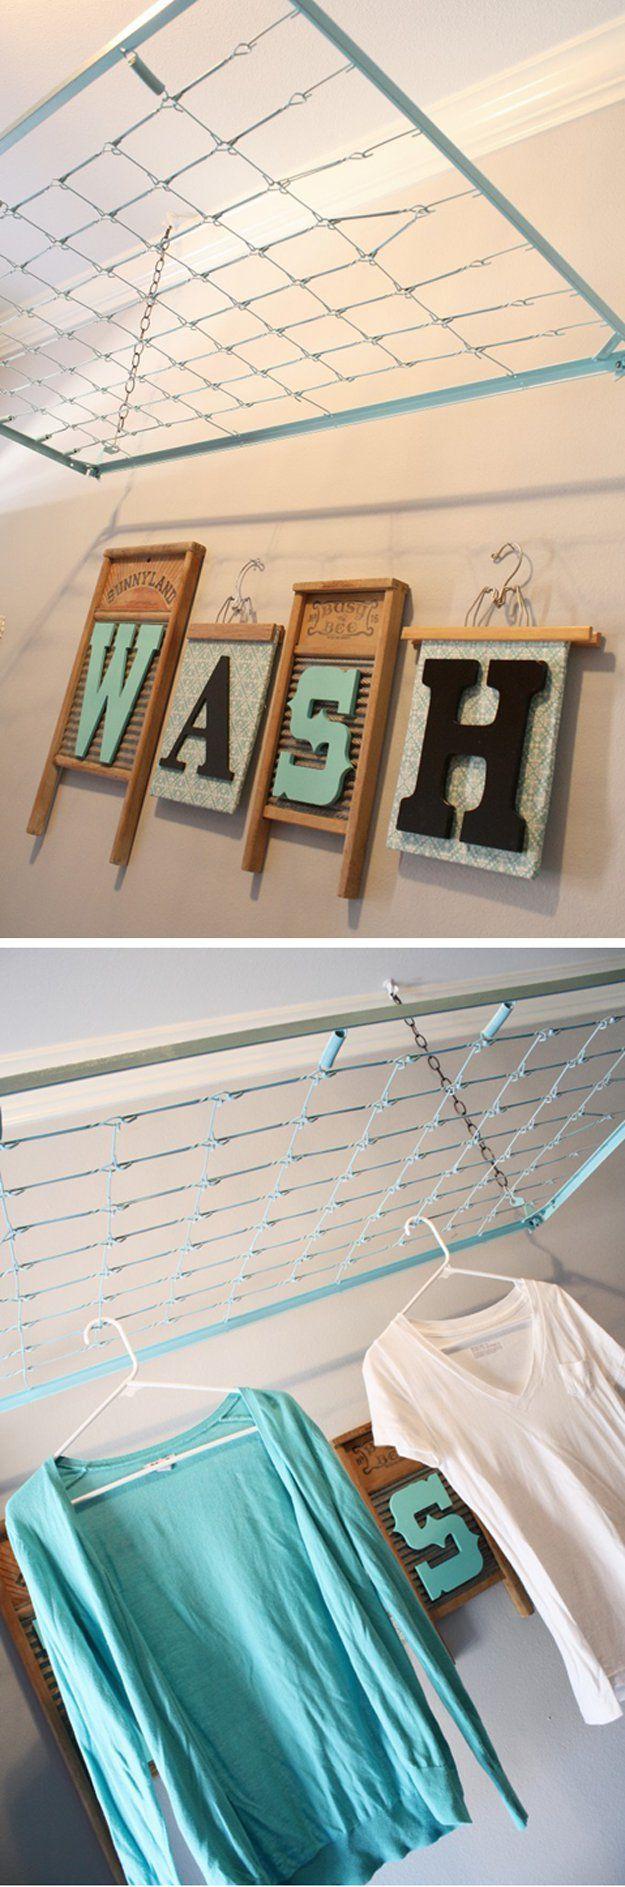 Impresionante Lavandería Tendedero Hacks | http://artesaniasdebricolaje.ru/laundry-room-organization-ideas/